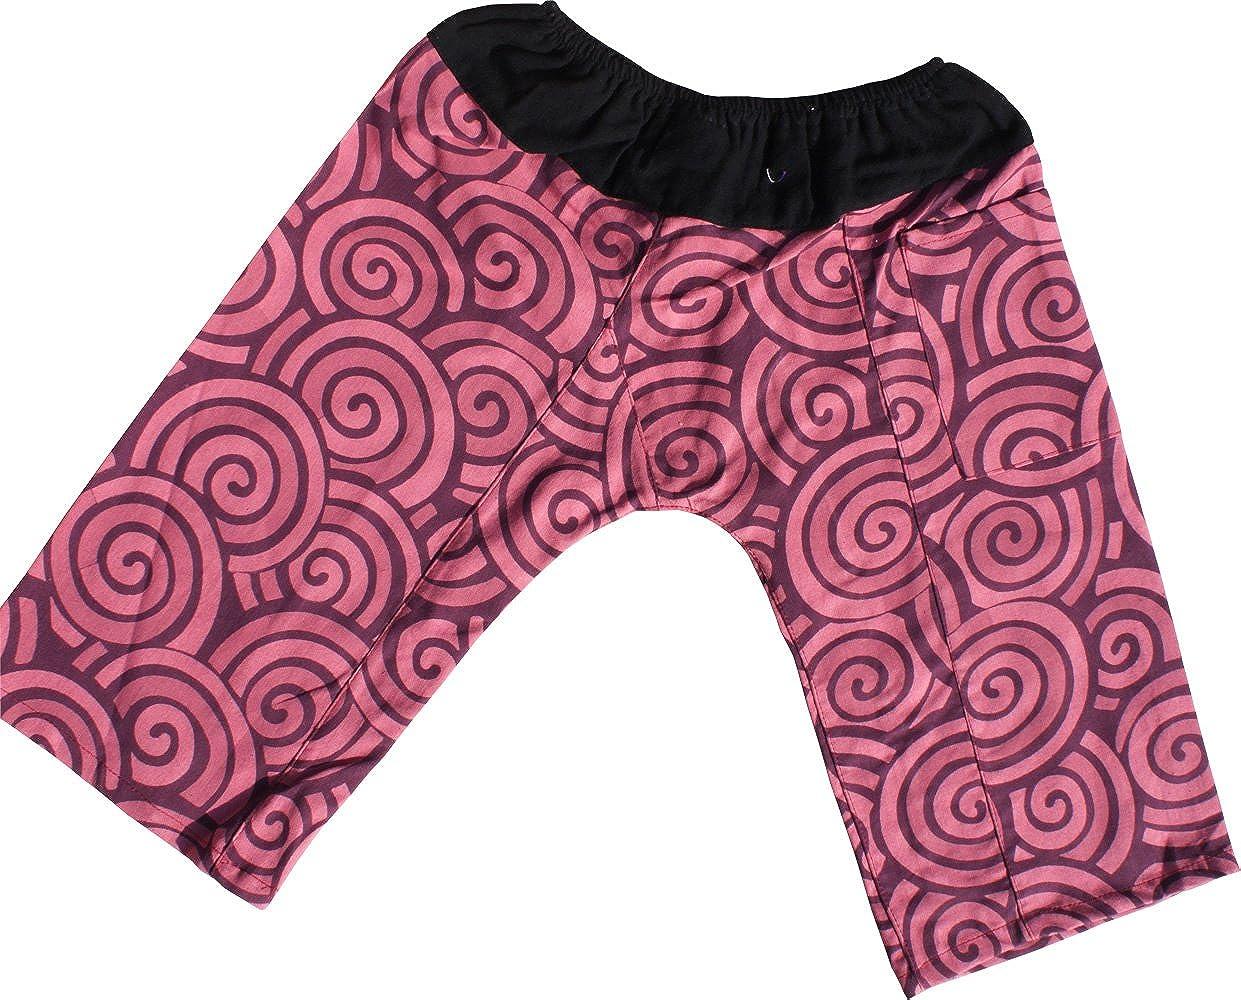 Raan Pah Muang Printed Light Summer Cotton Childrens Baggy Elastic Waist Pants